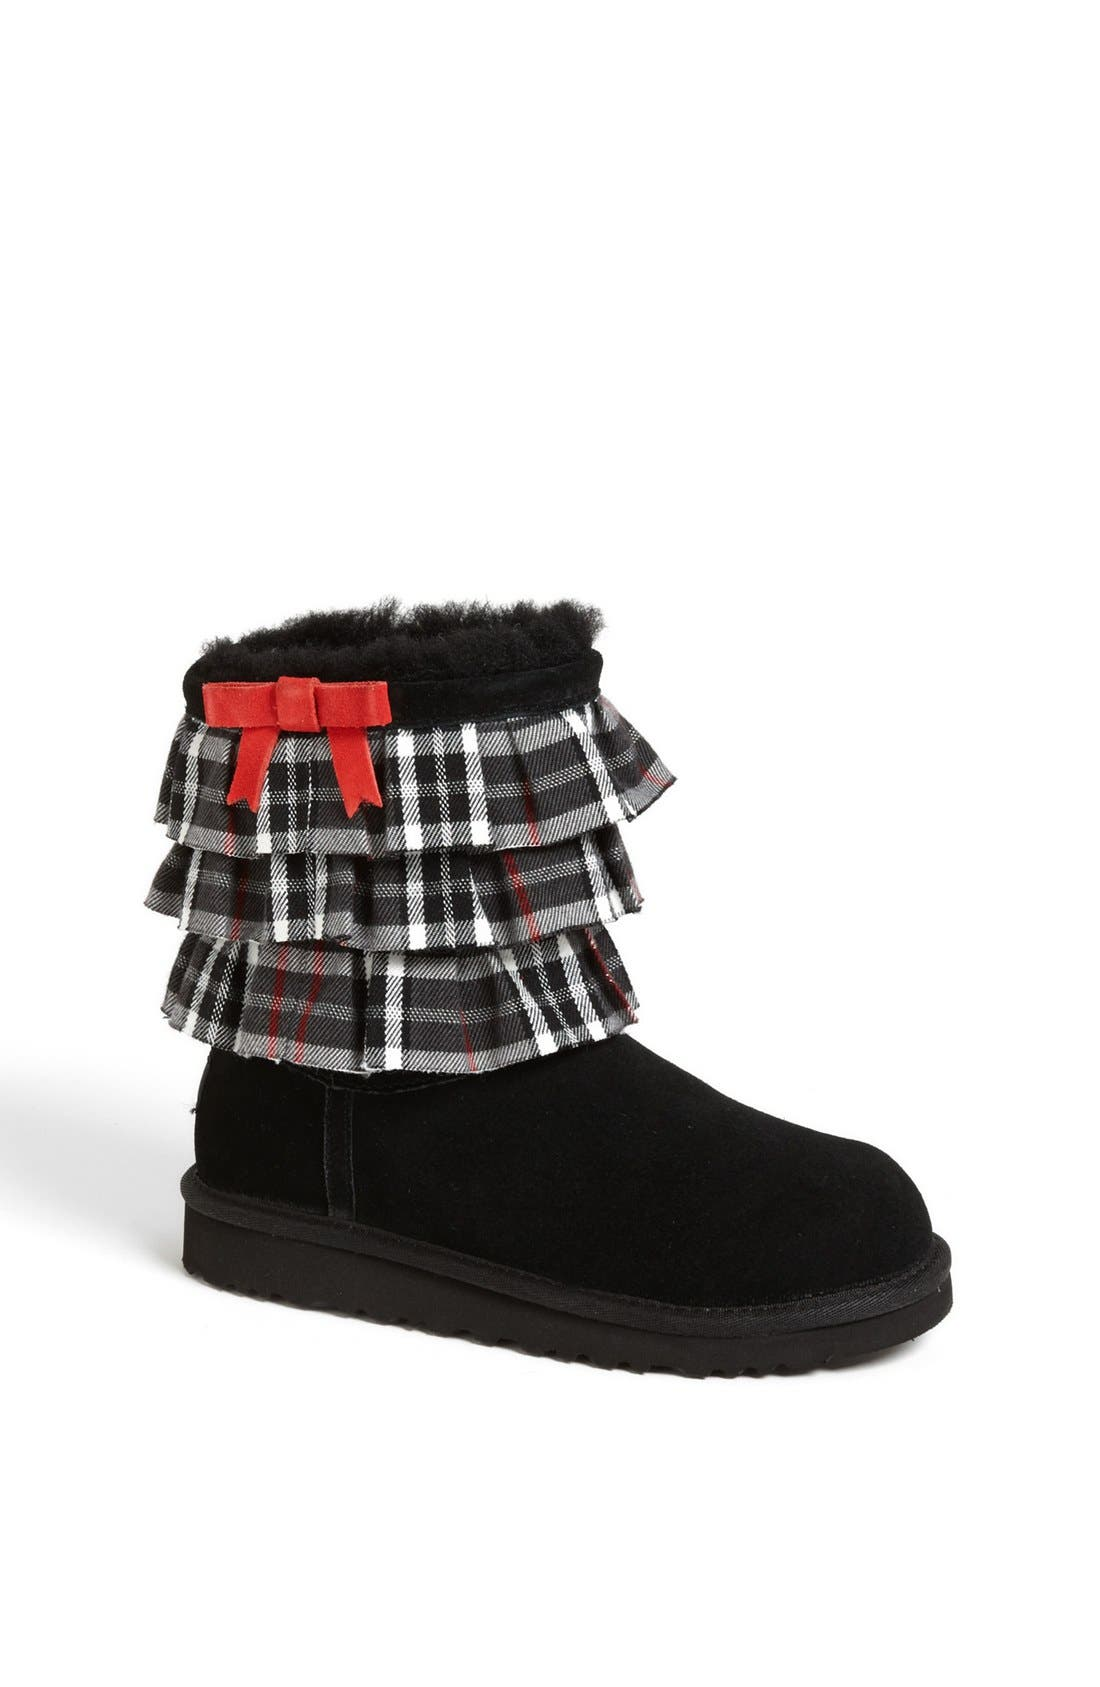 Alternate Image 1 Selected - UGG® Australia 'Eloise' Boot (Toddler, Little Kid & Big Kid)